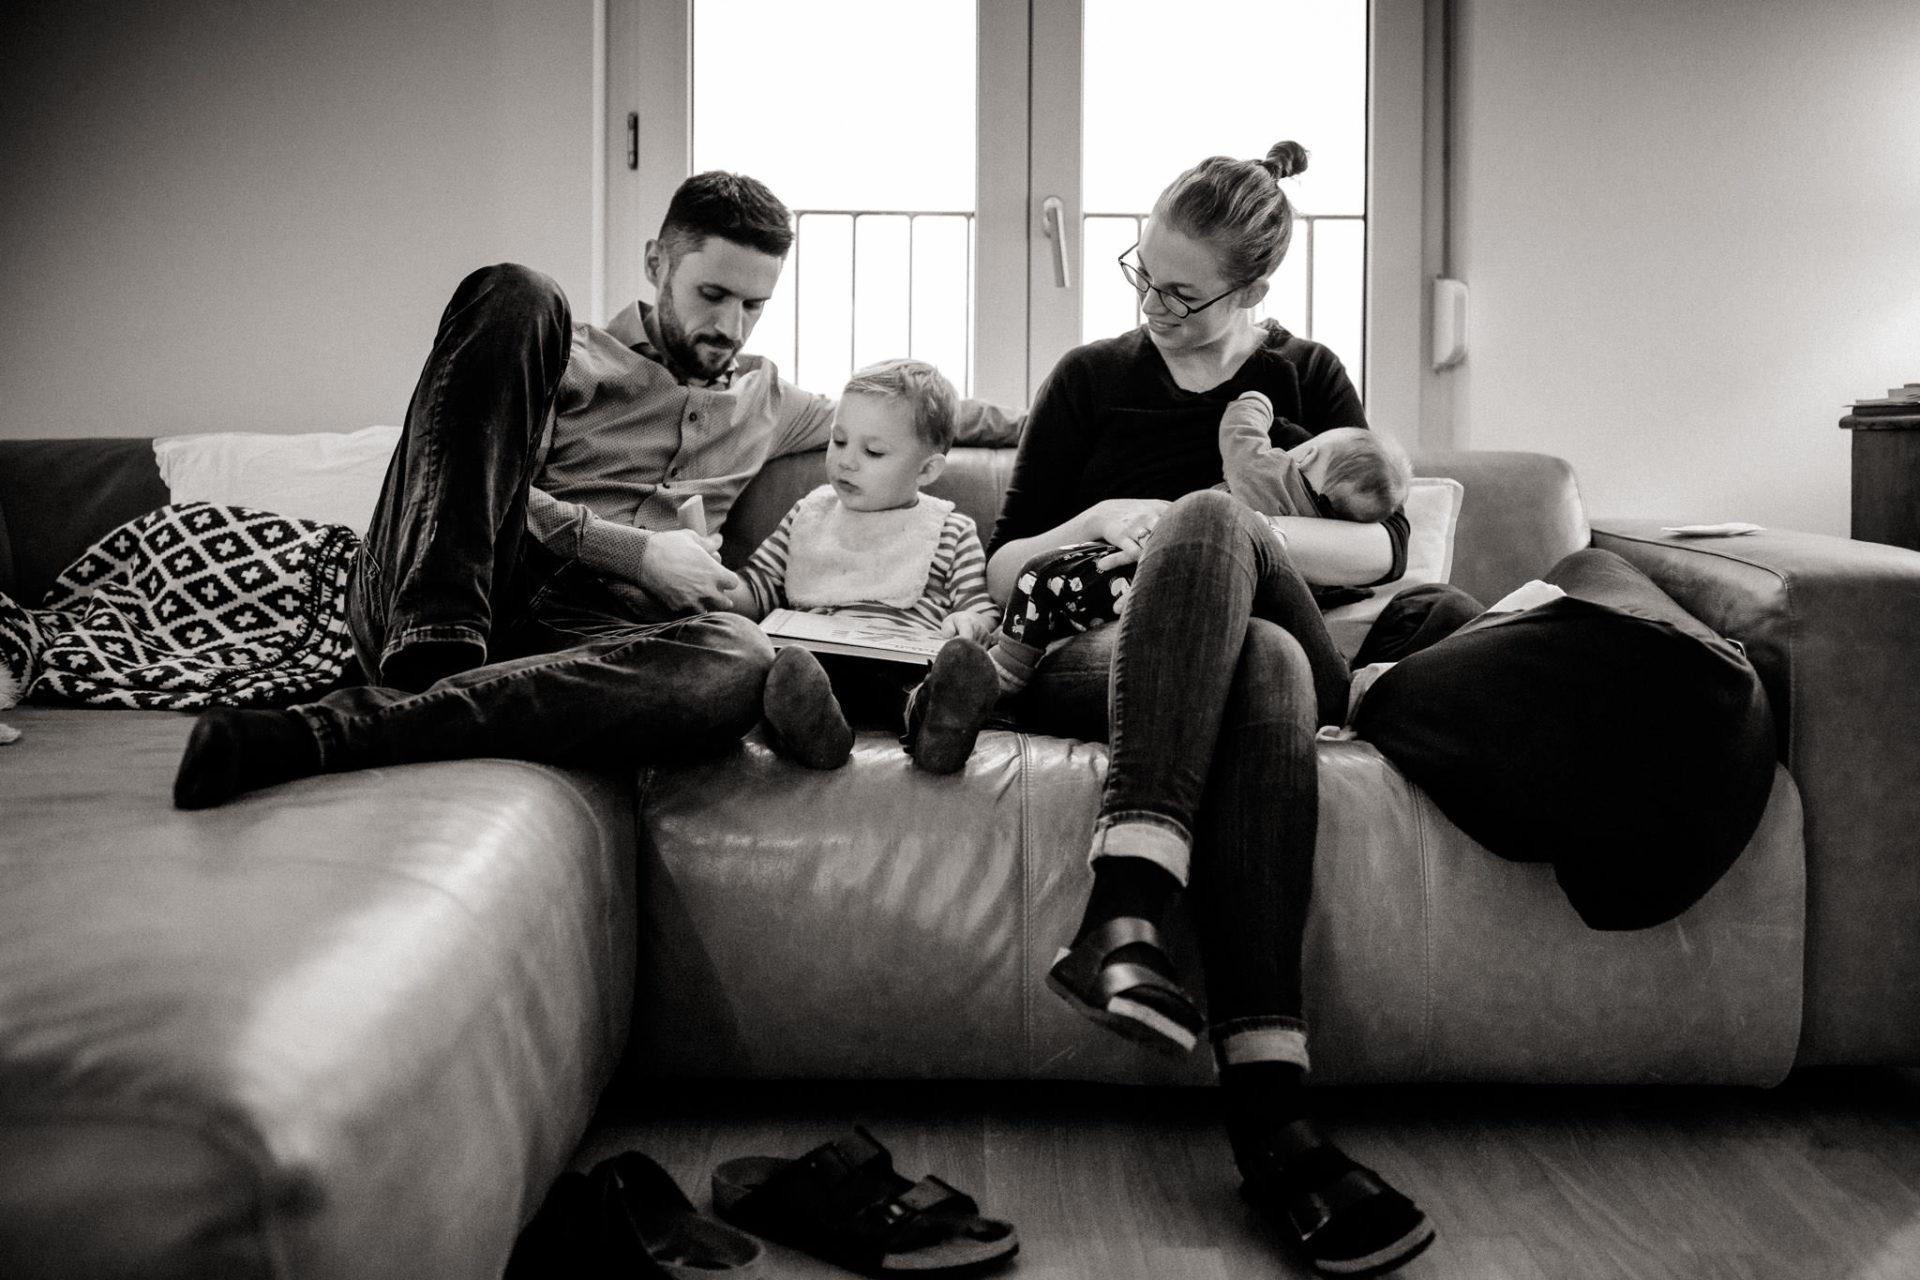 familienfotografie-mainz-journalistische-kinderbilder-neugeborenen-fotos